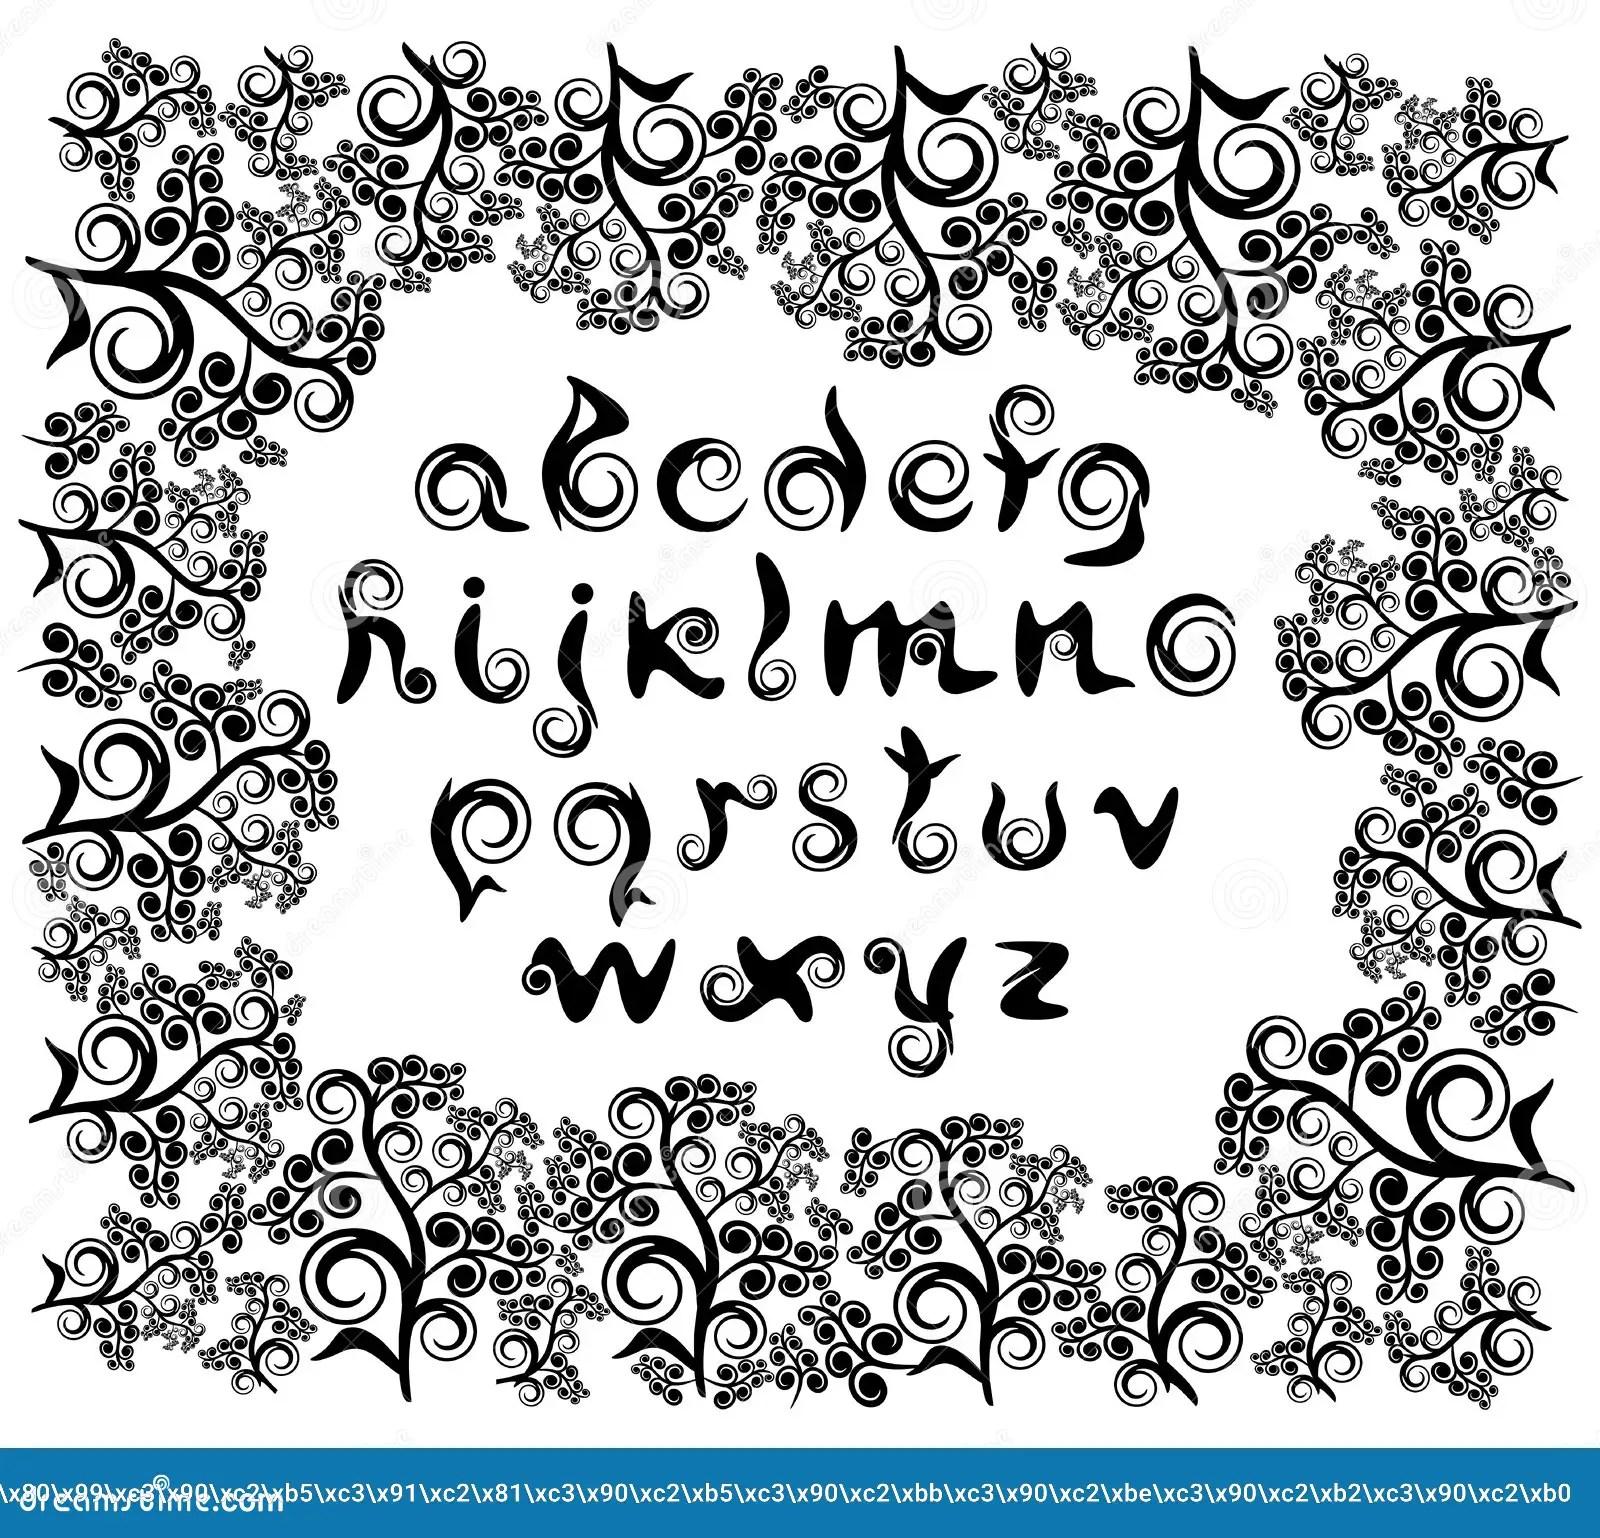 Cursive Letter O Lowercase